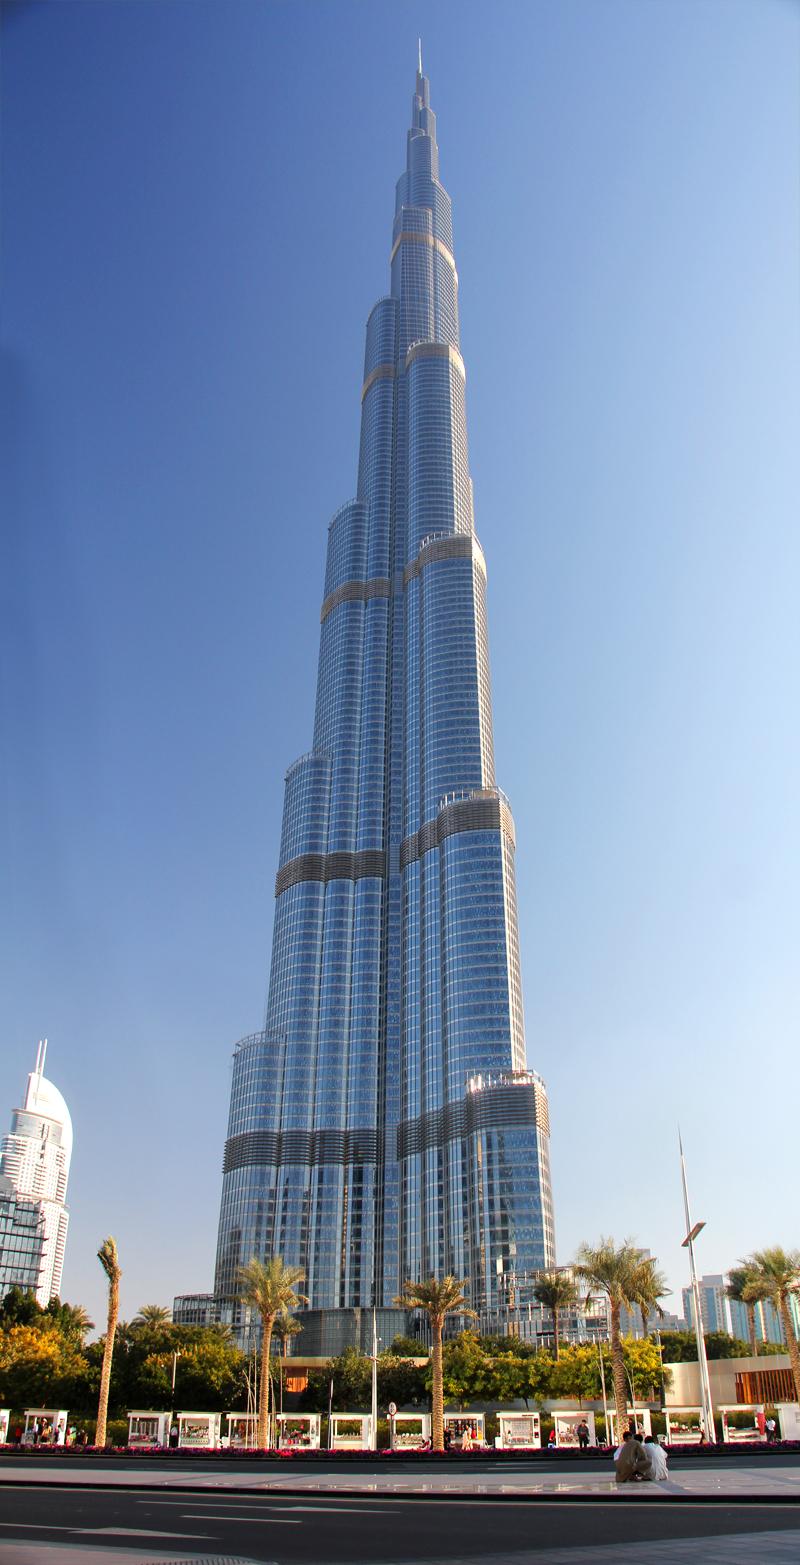 Burj-Khalifa, Dubai (Tallest Building In The World) [16 ...